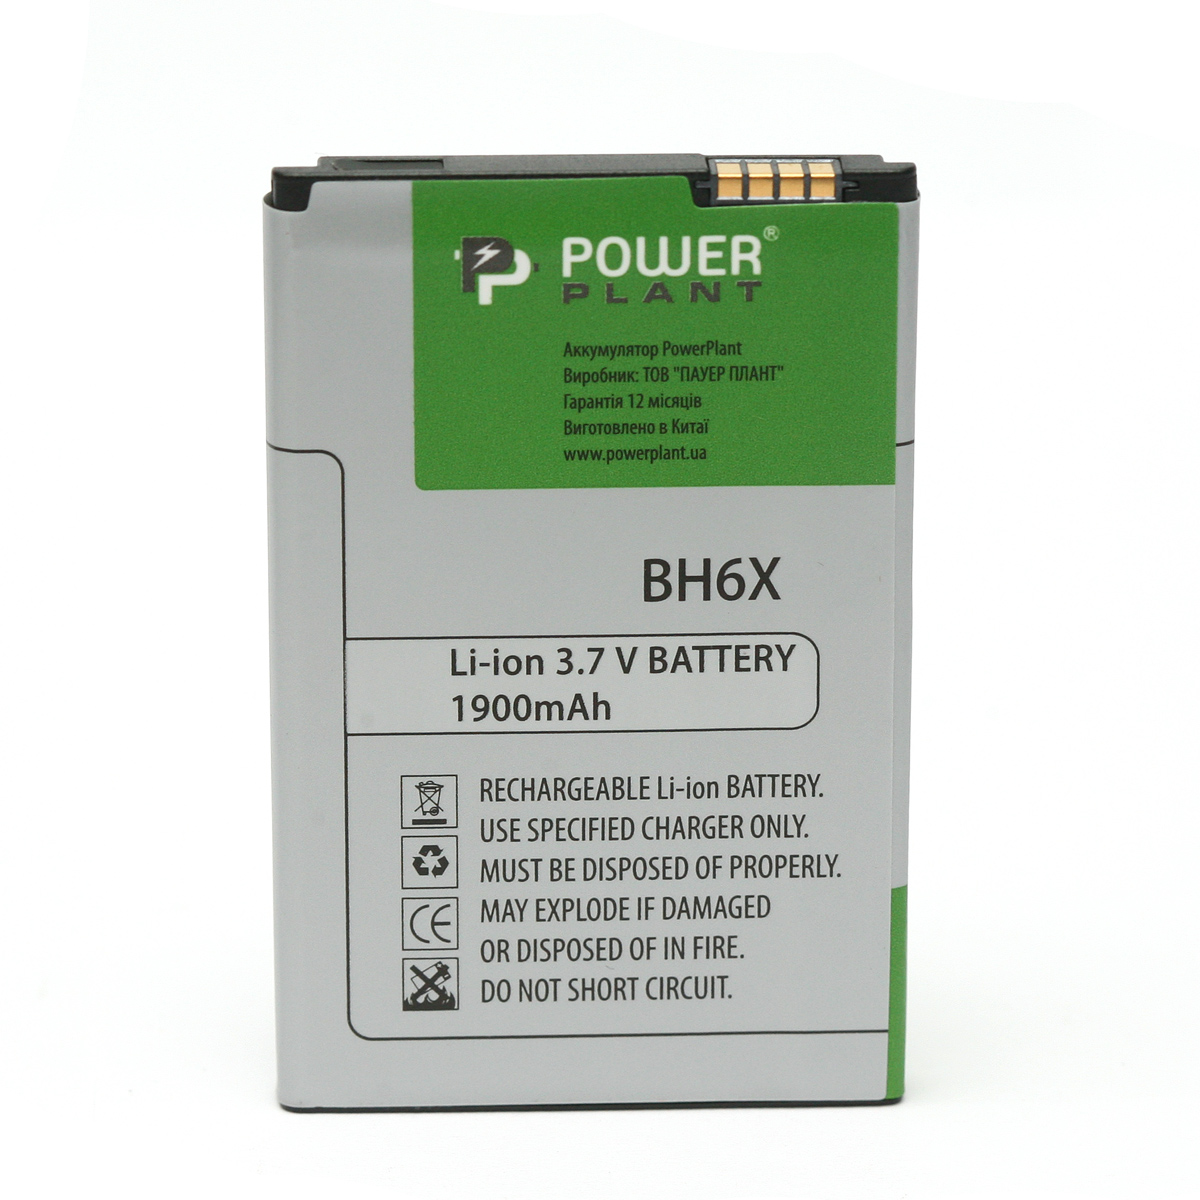 Купить Аккумулятор PowerPlant Motorola MB860 (BH6X) 1900mAh